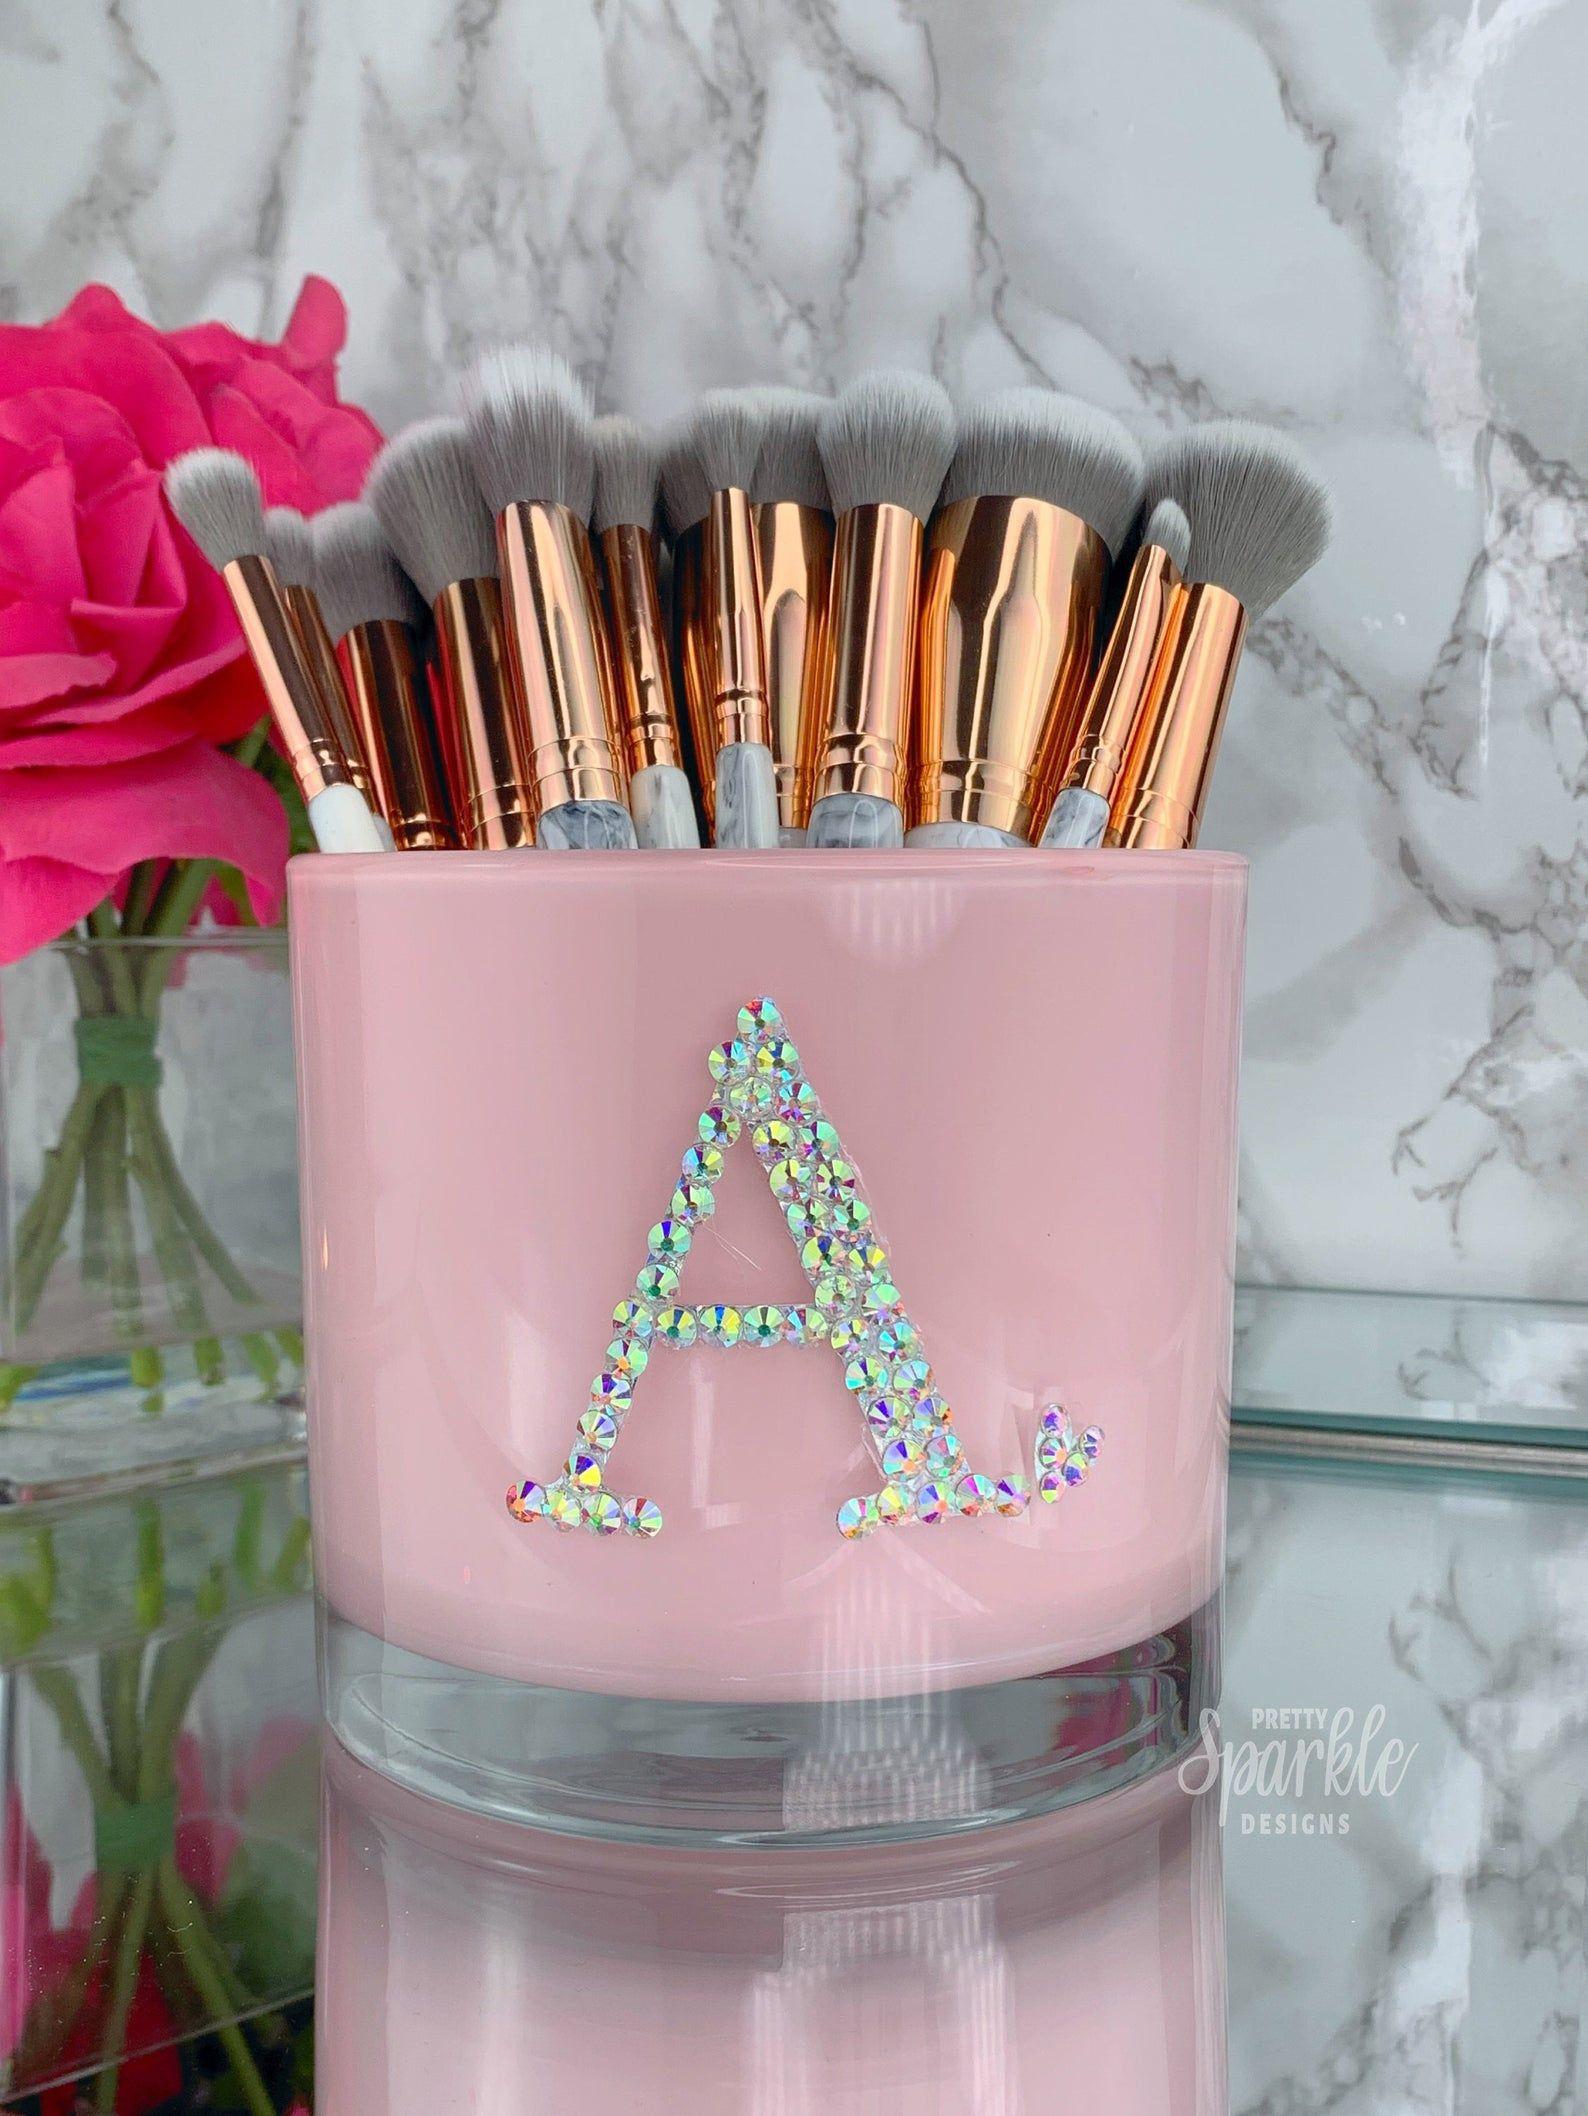 Large Makeup Brush Holder, Makeup Brush Holder, Girly